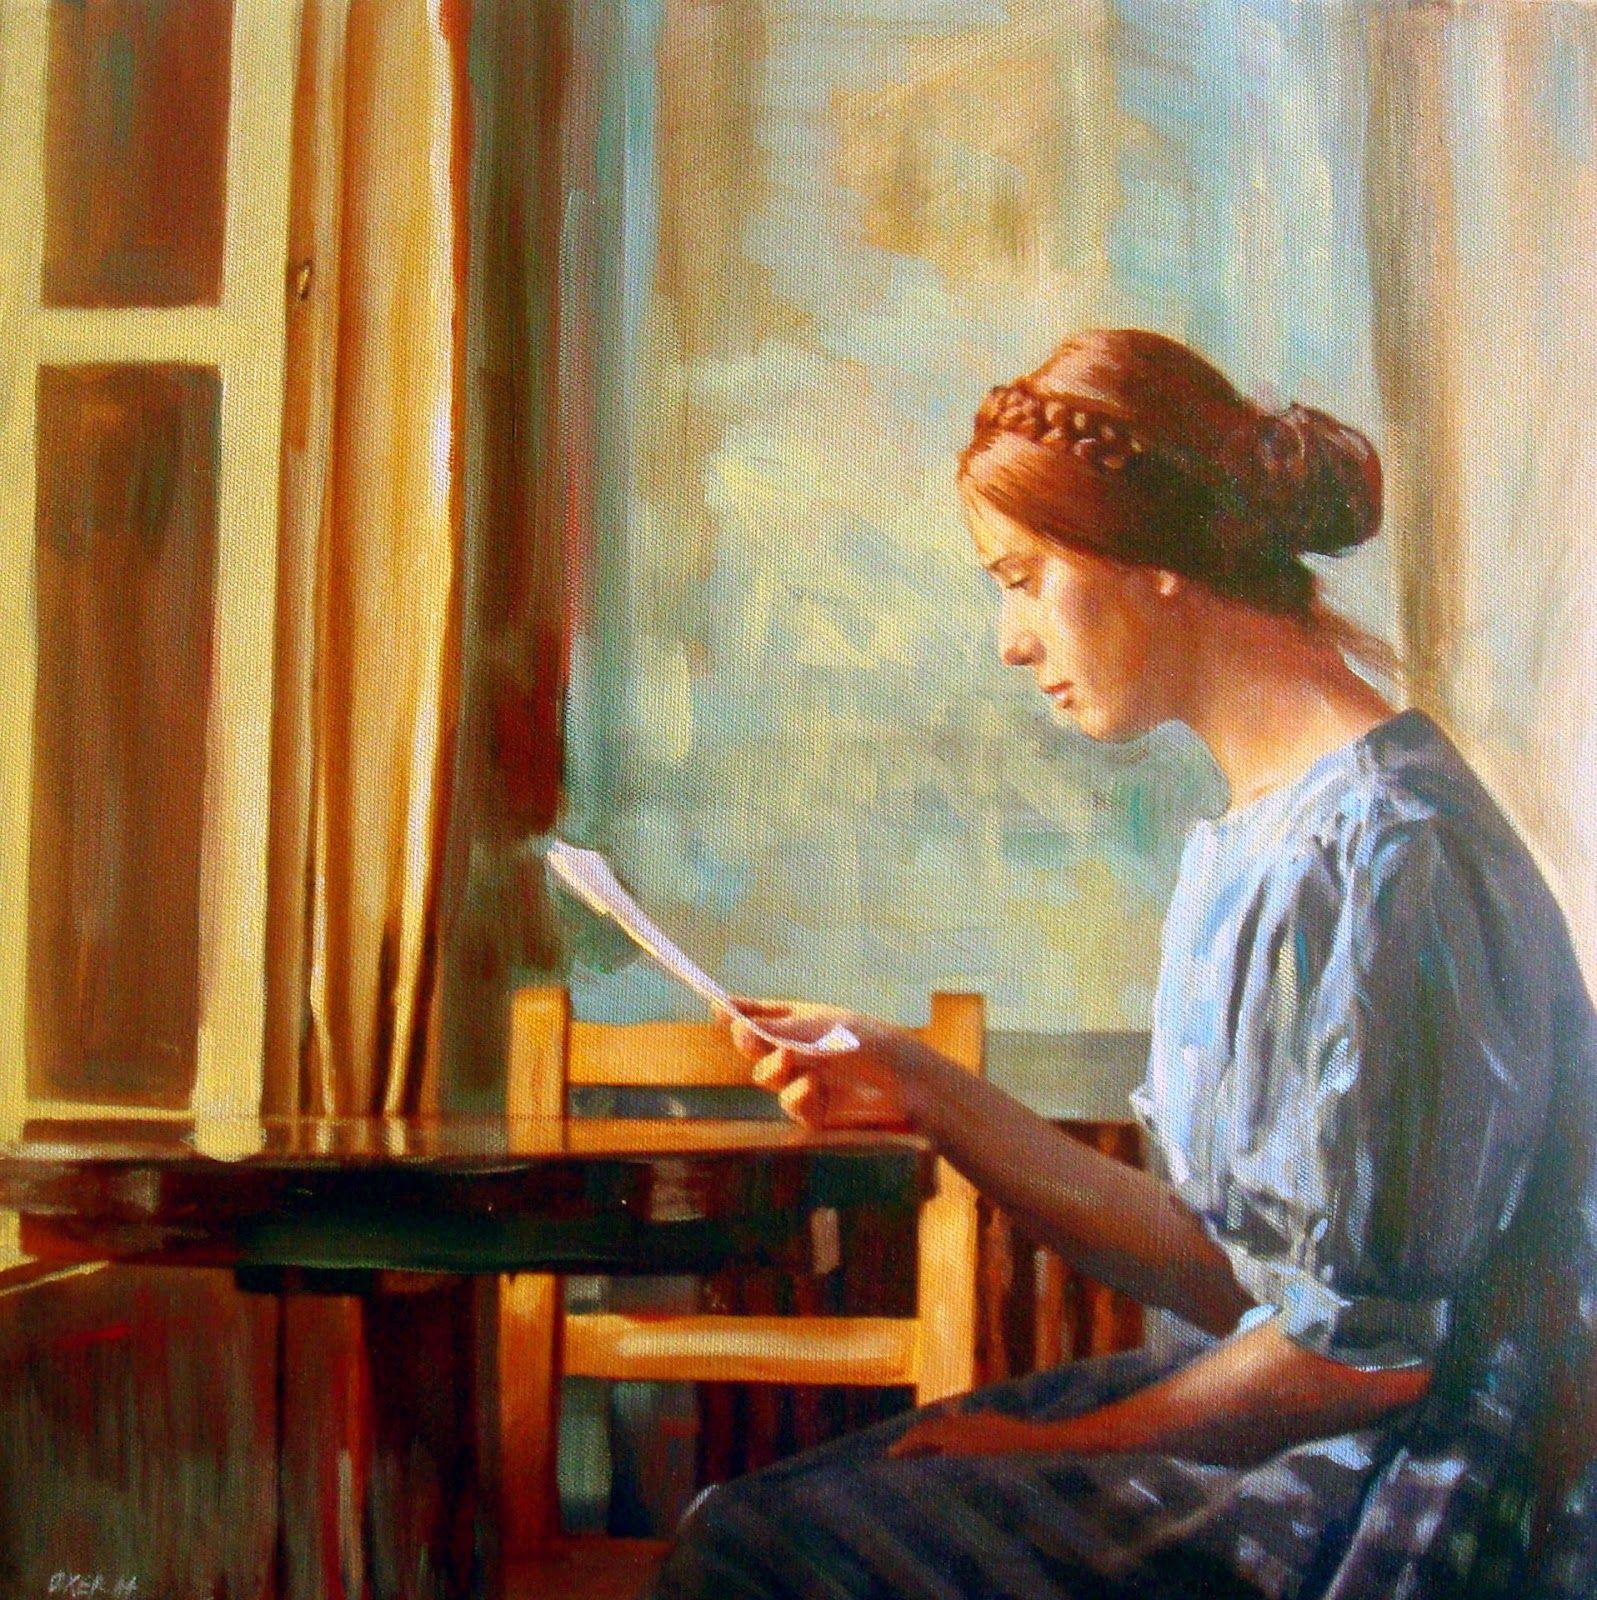 William oxer letter artartist paintingfigurative